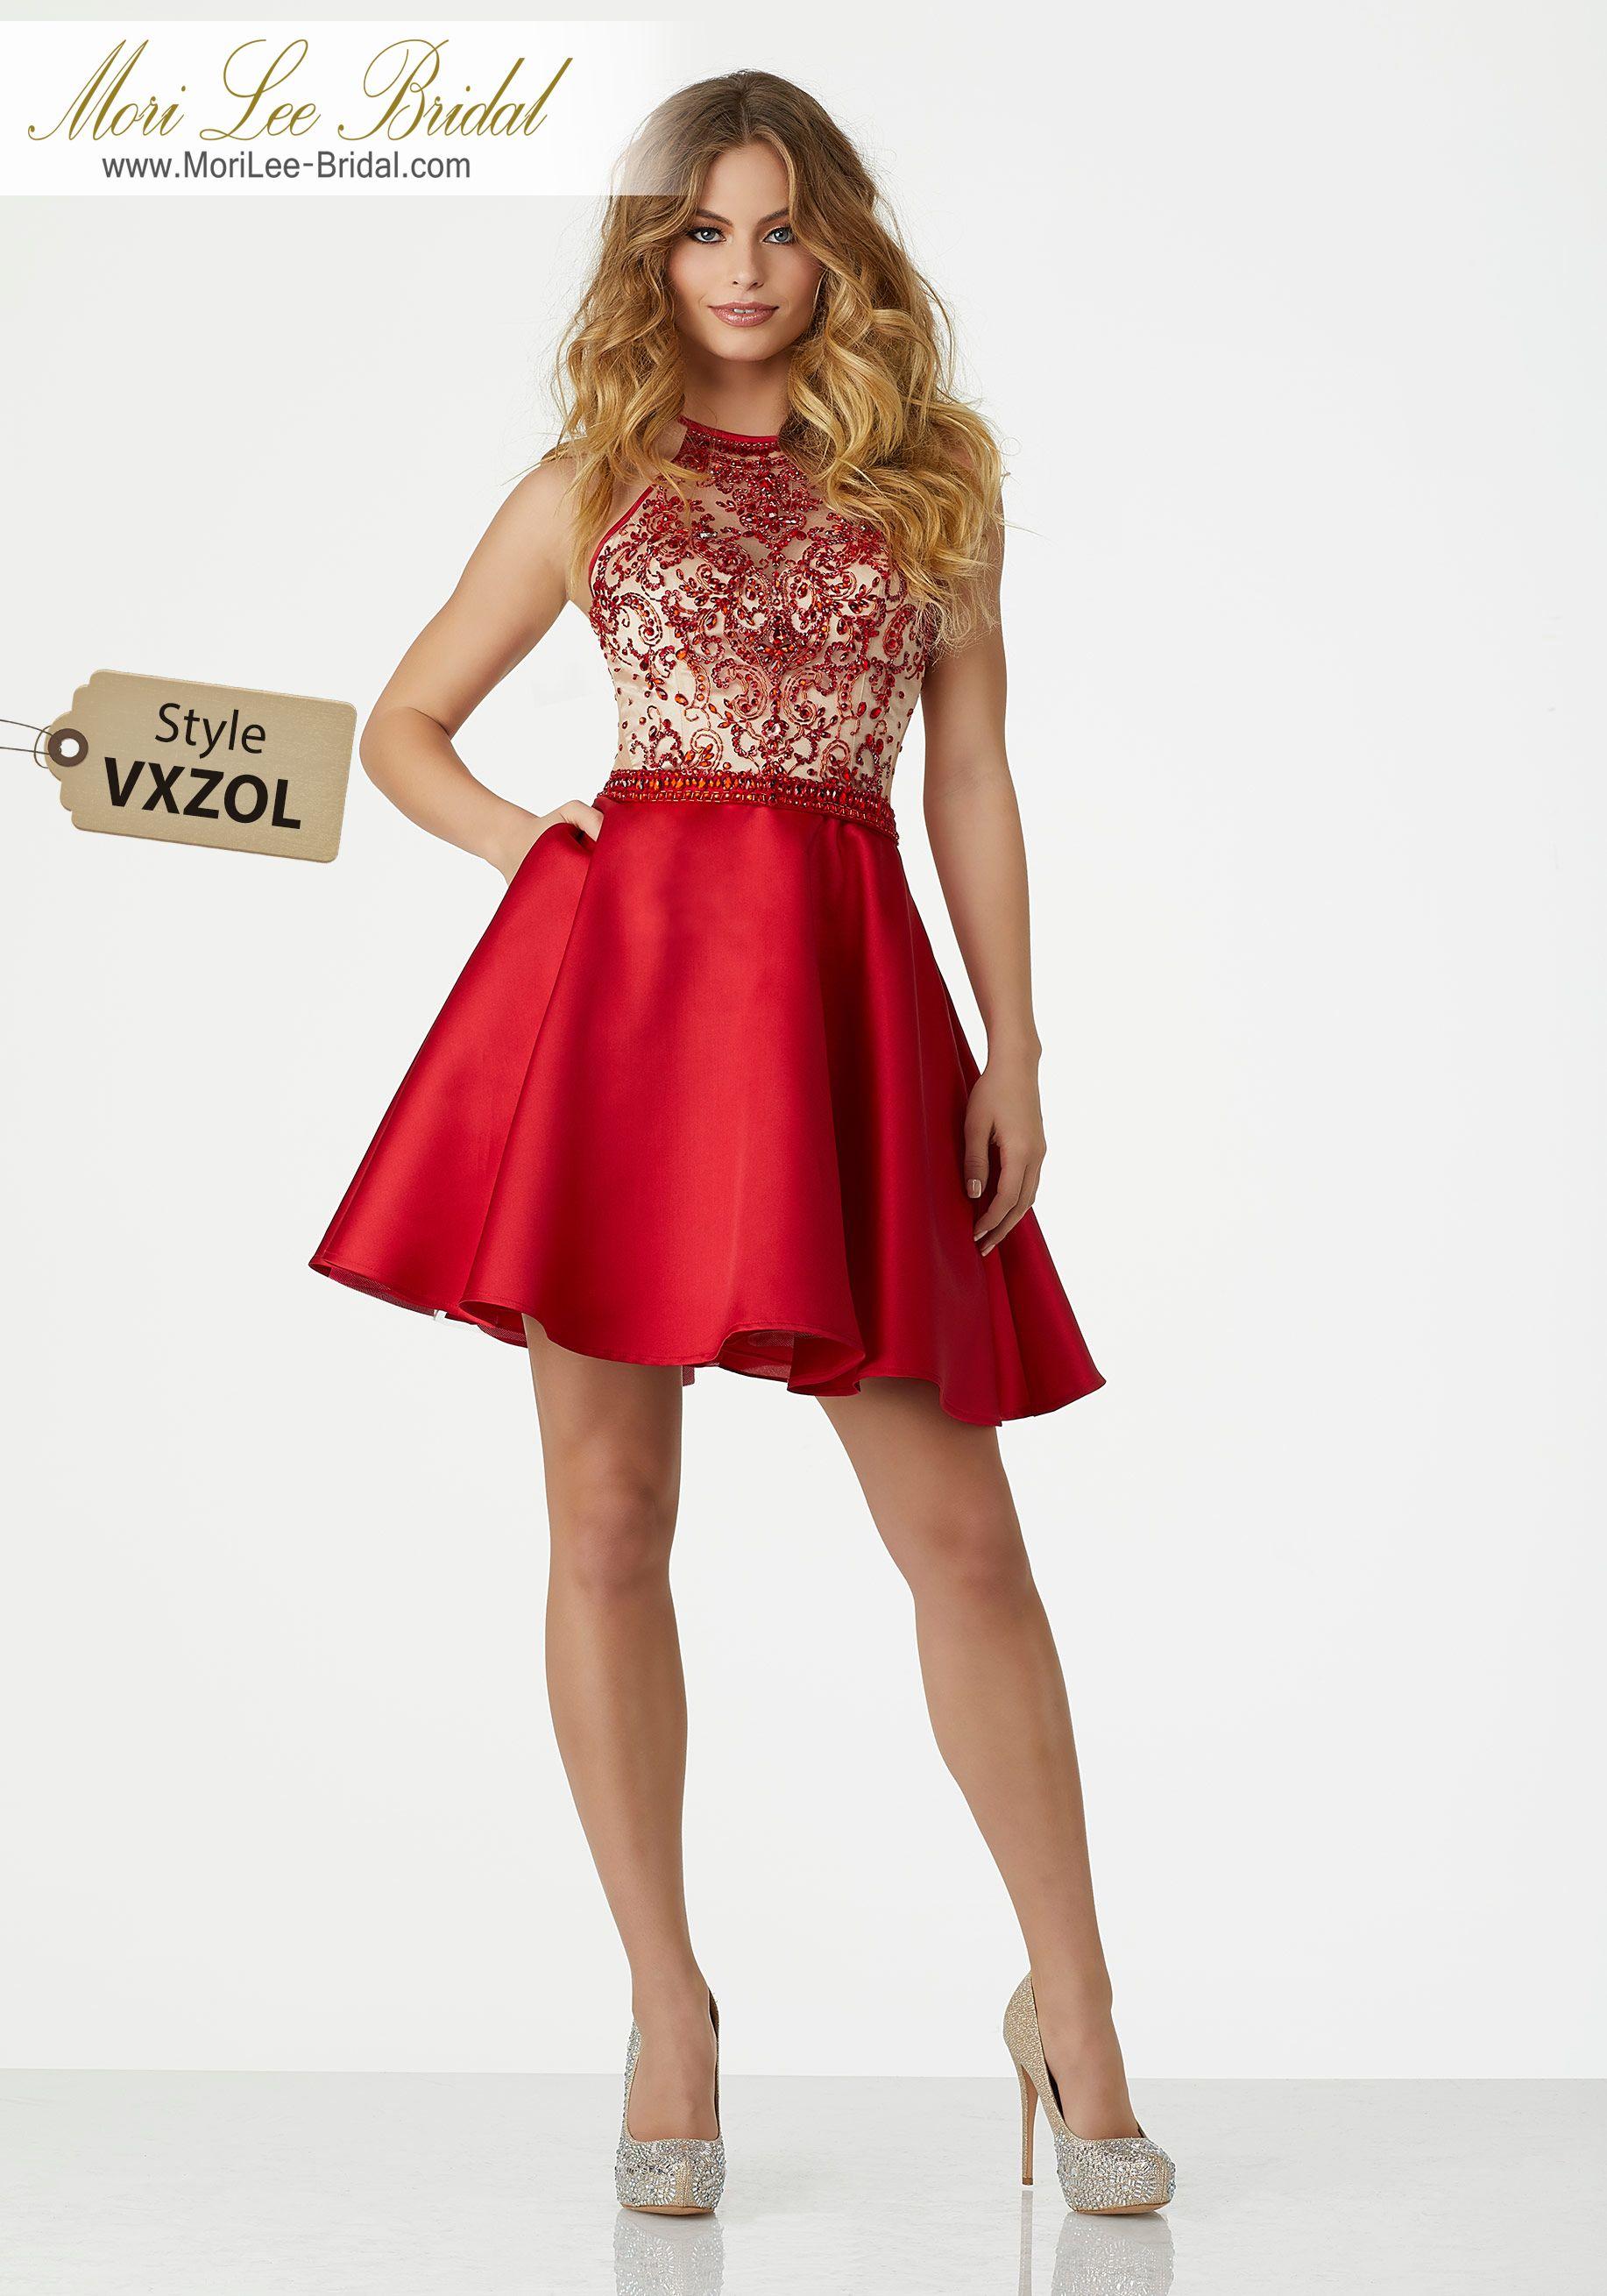 Yizi royal red satin skirt and red black